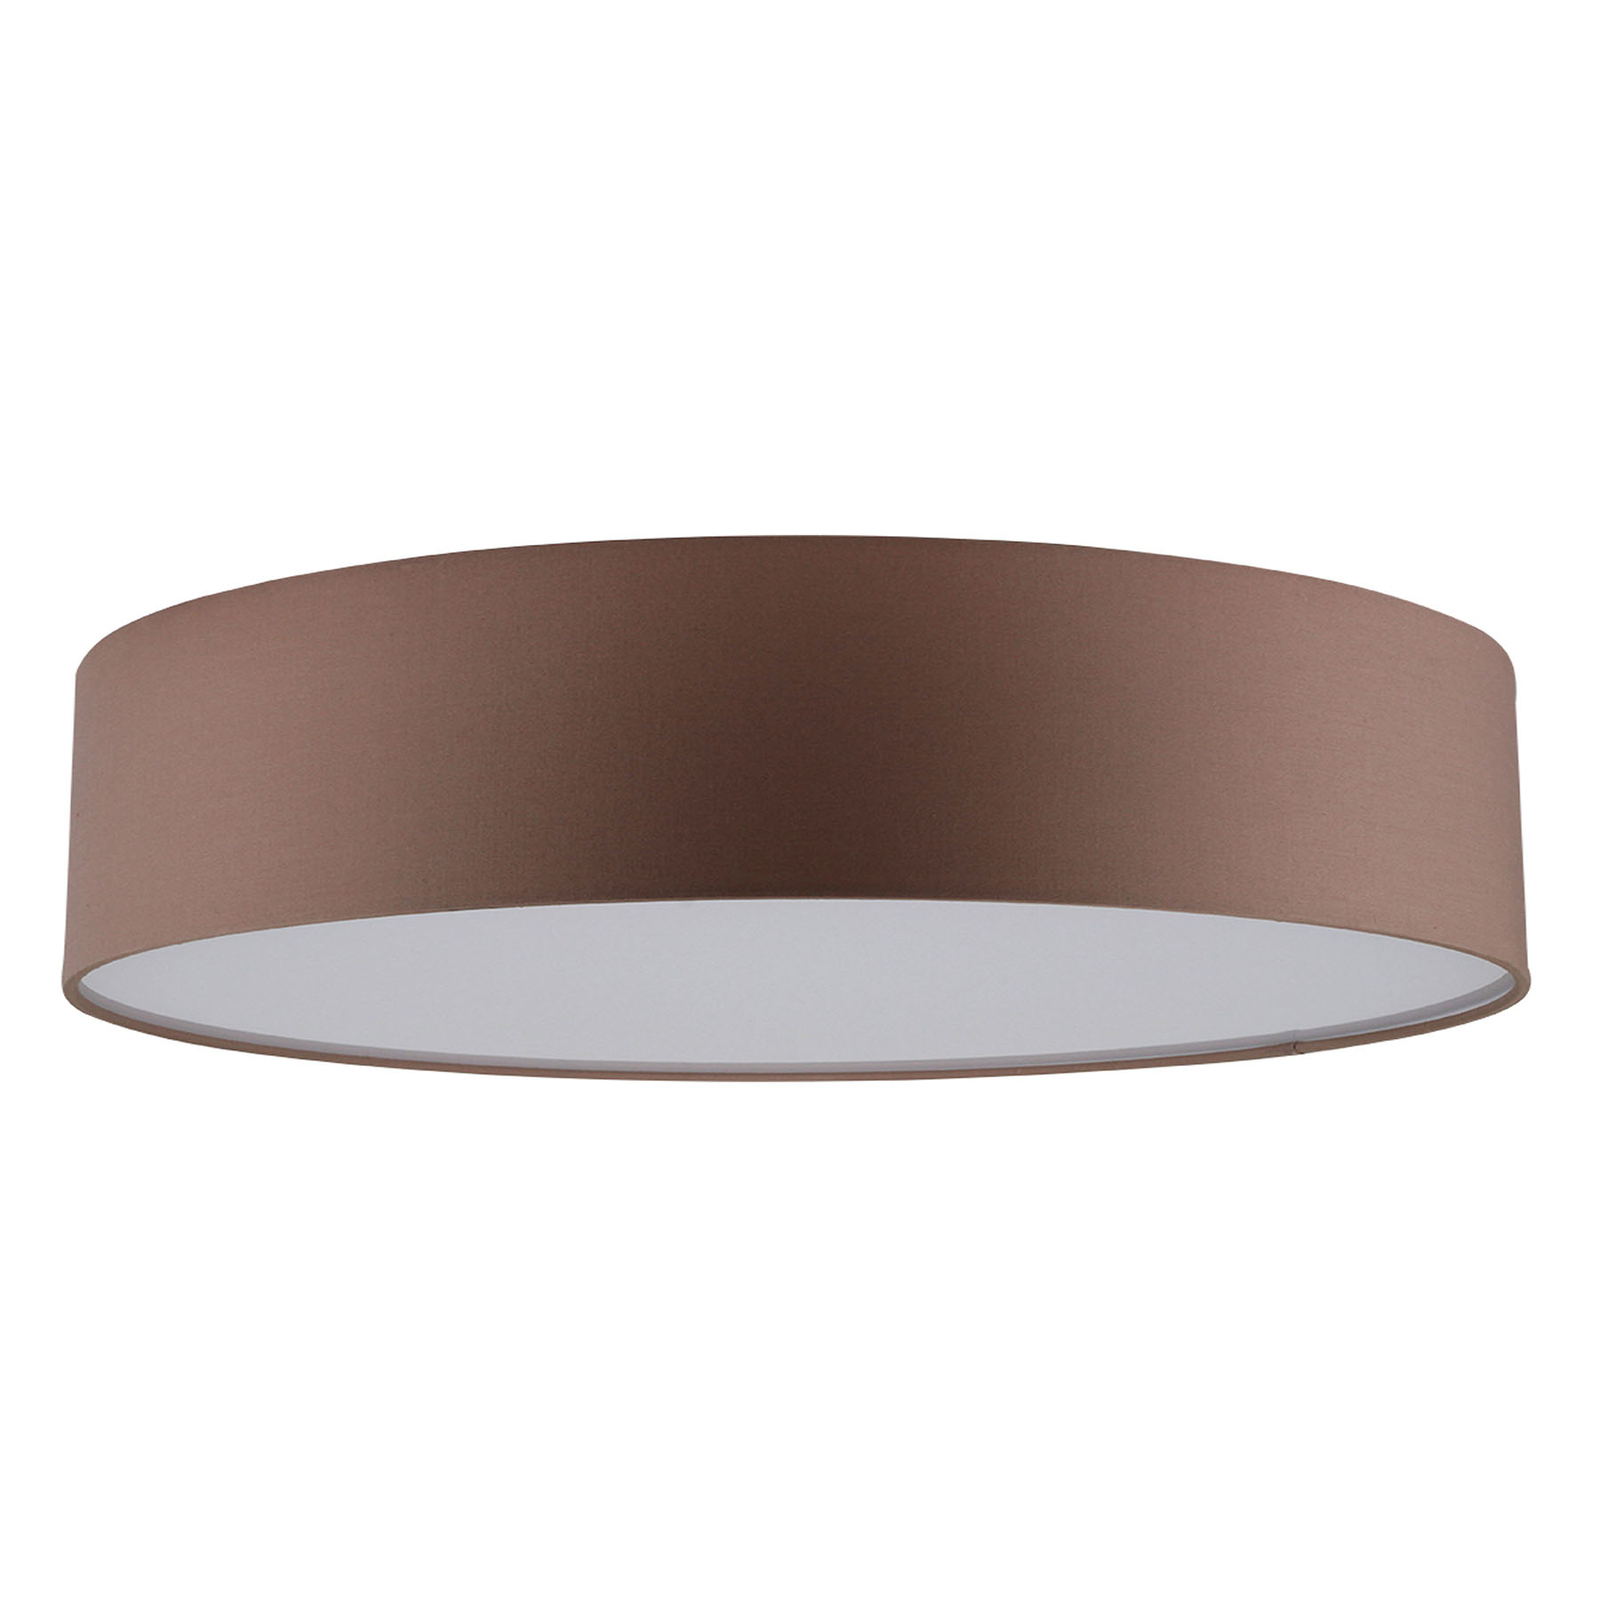 Lampa sufitowa LED Josefina, Ø 48 cm, brązowa